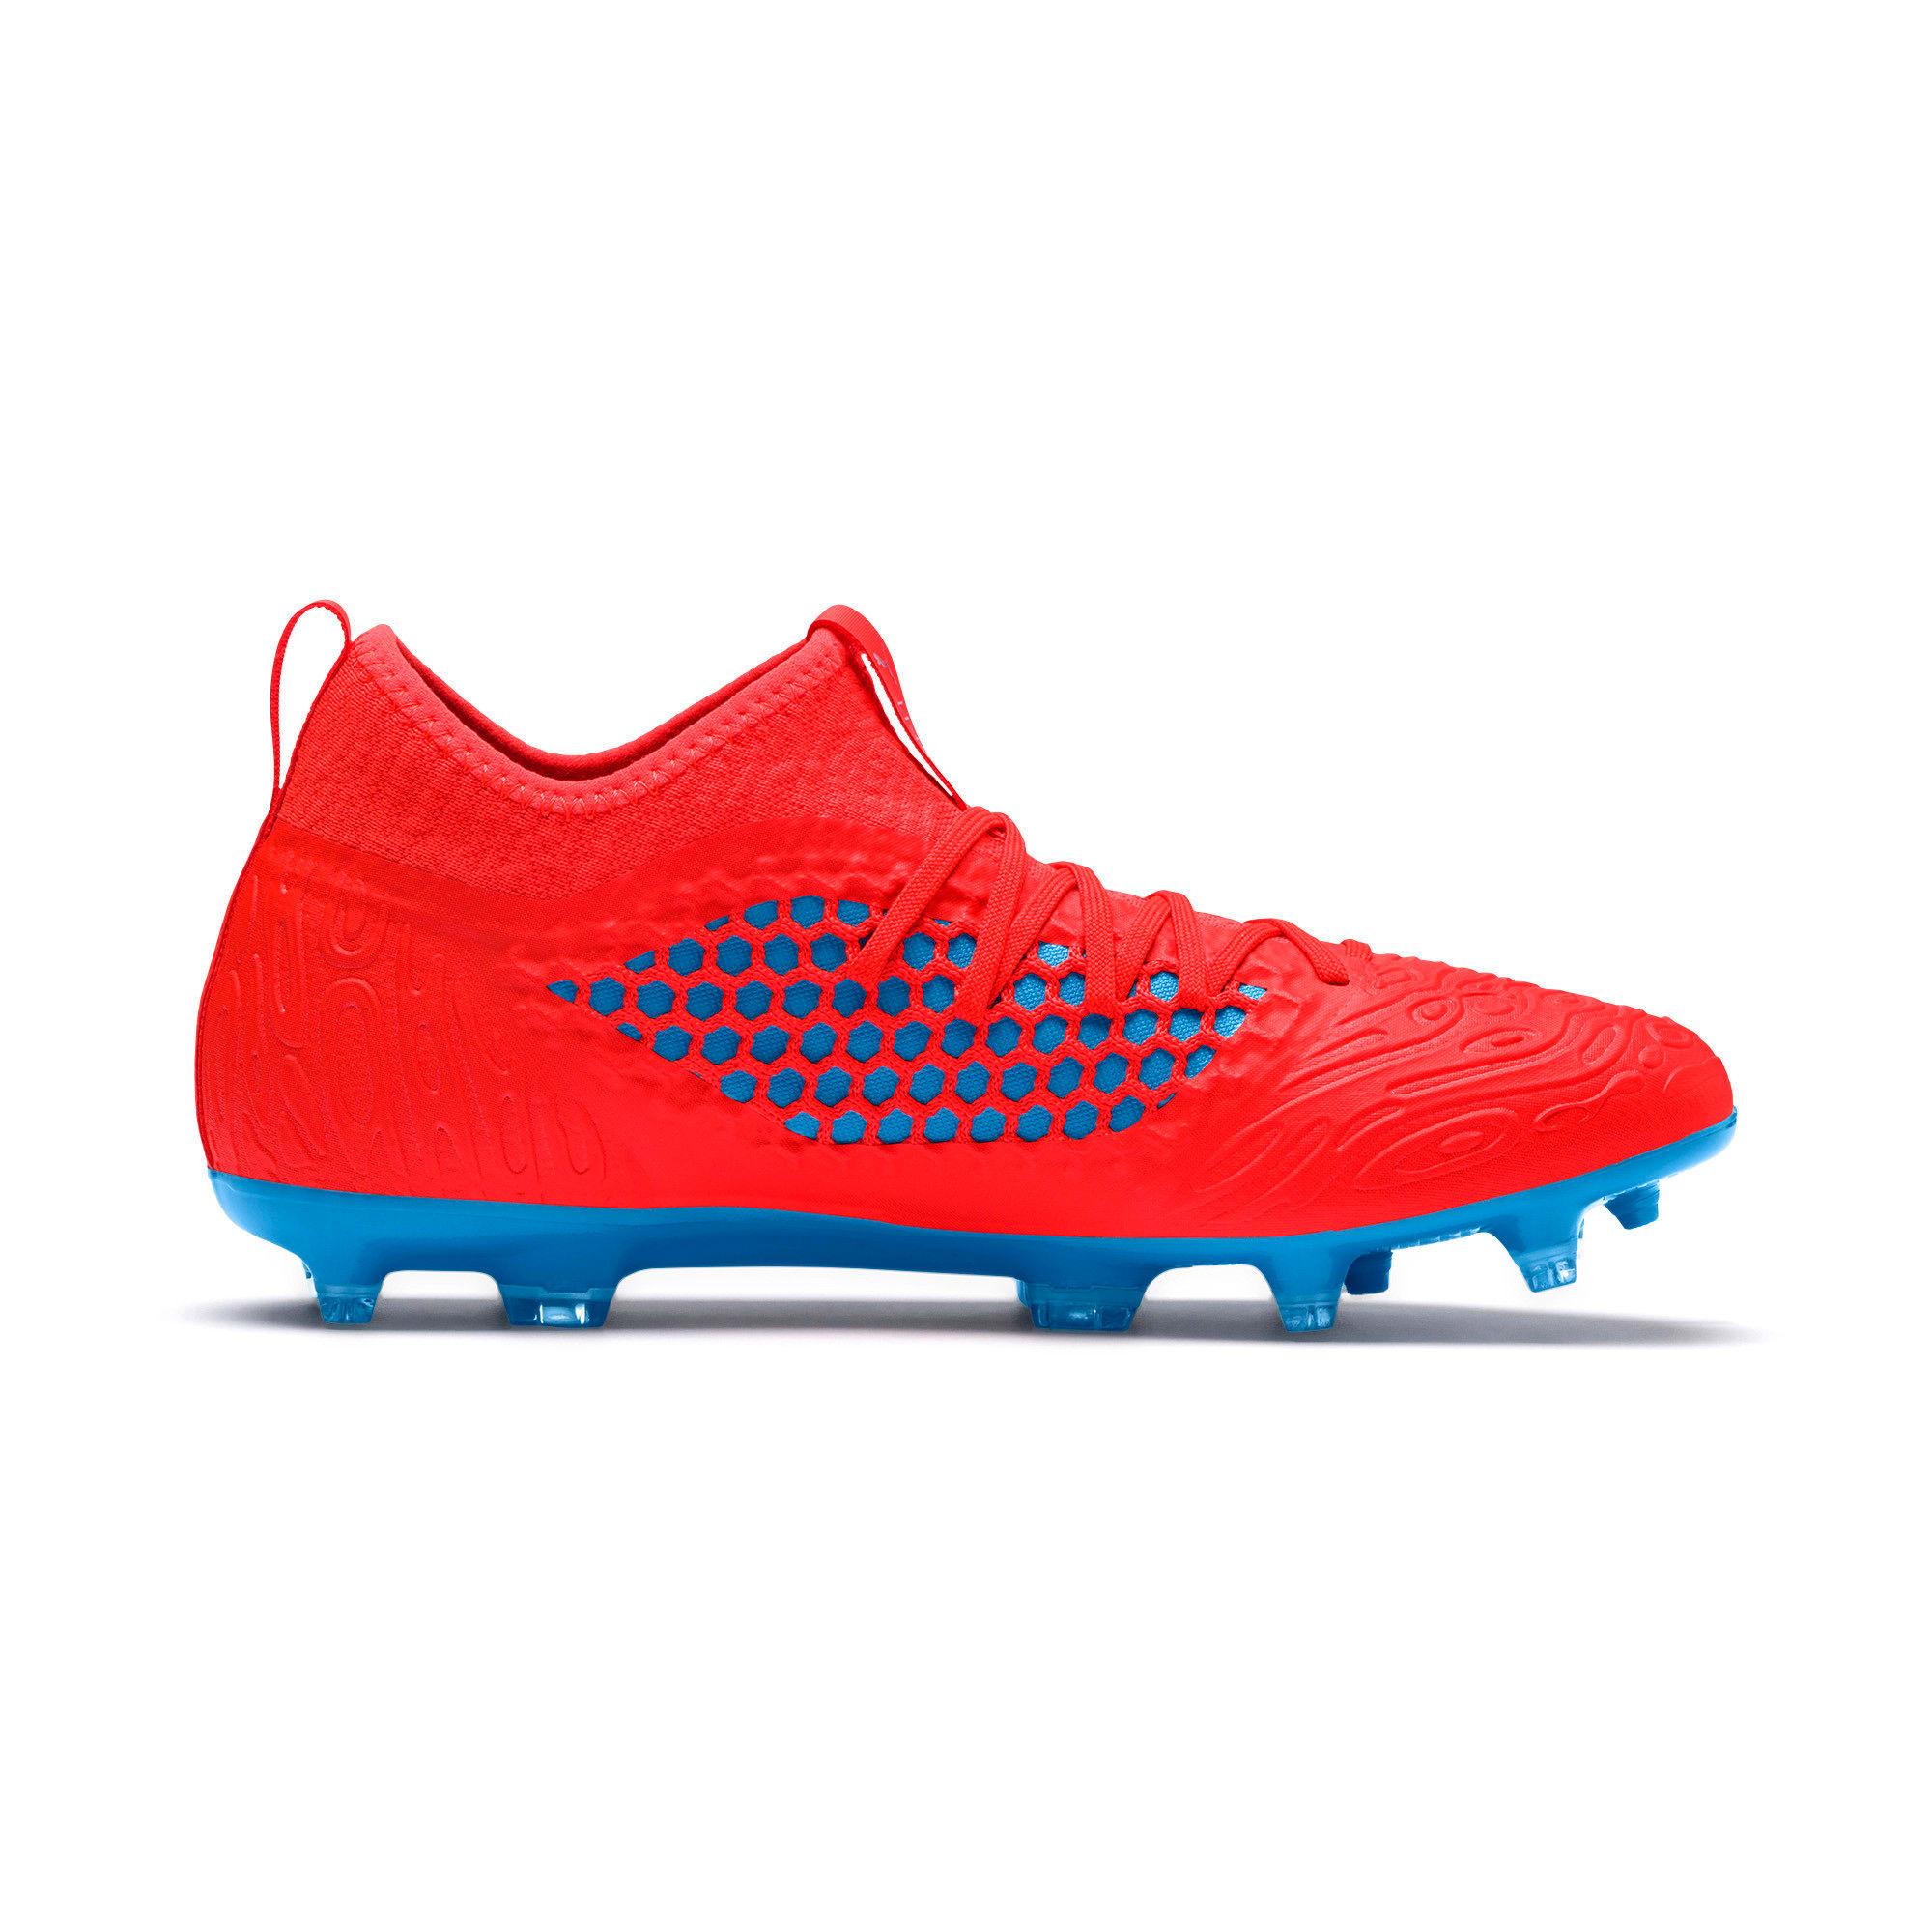 Thumbnail 5 of FUTURE 19.3 NETFIT FG/AG Men's Football Boots, Red Blast-Bleu Azur, medium-IND